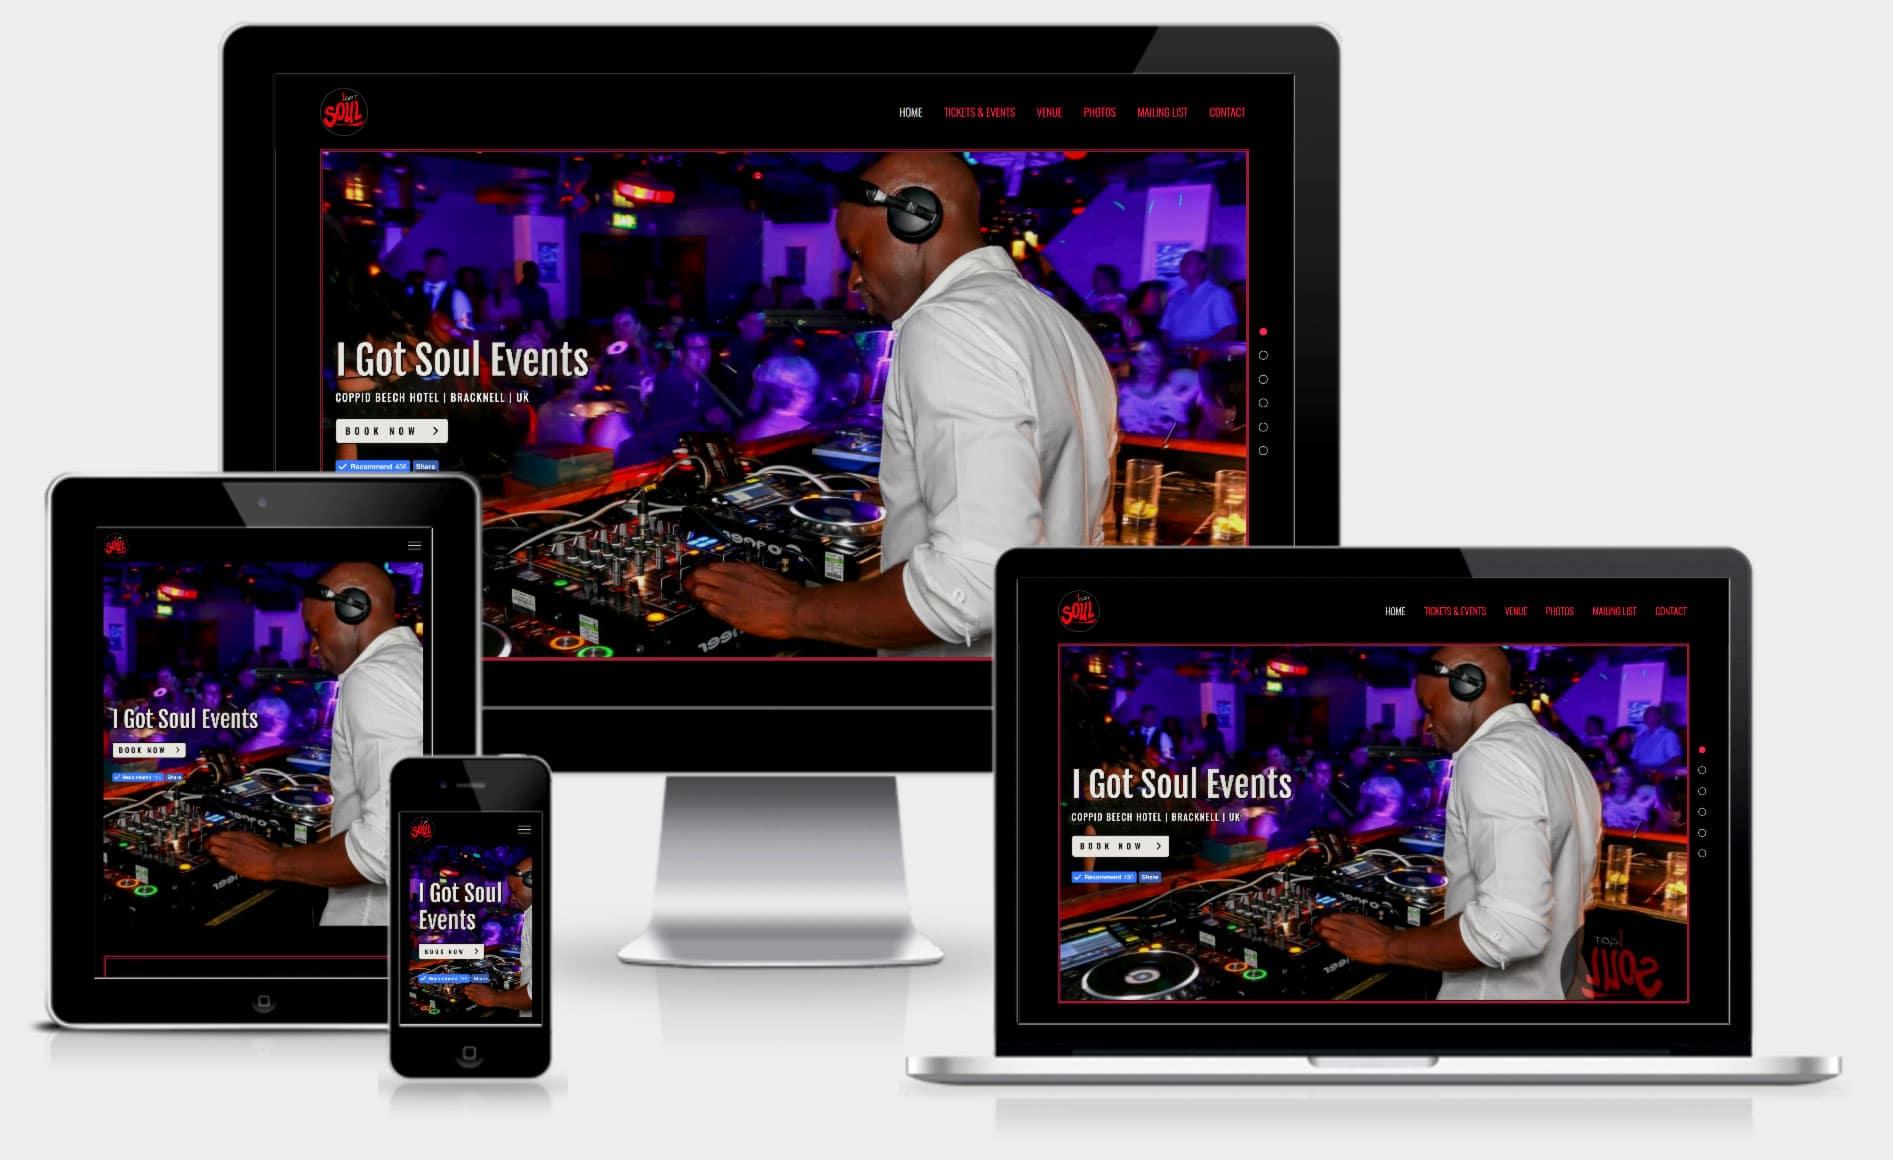 i-got-soul-events-mpower-webdesign-template